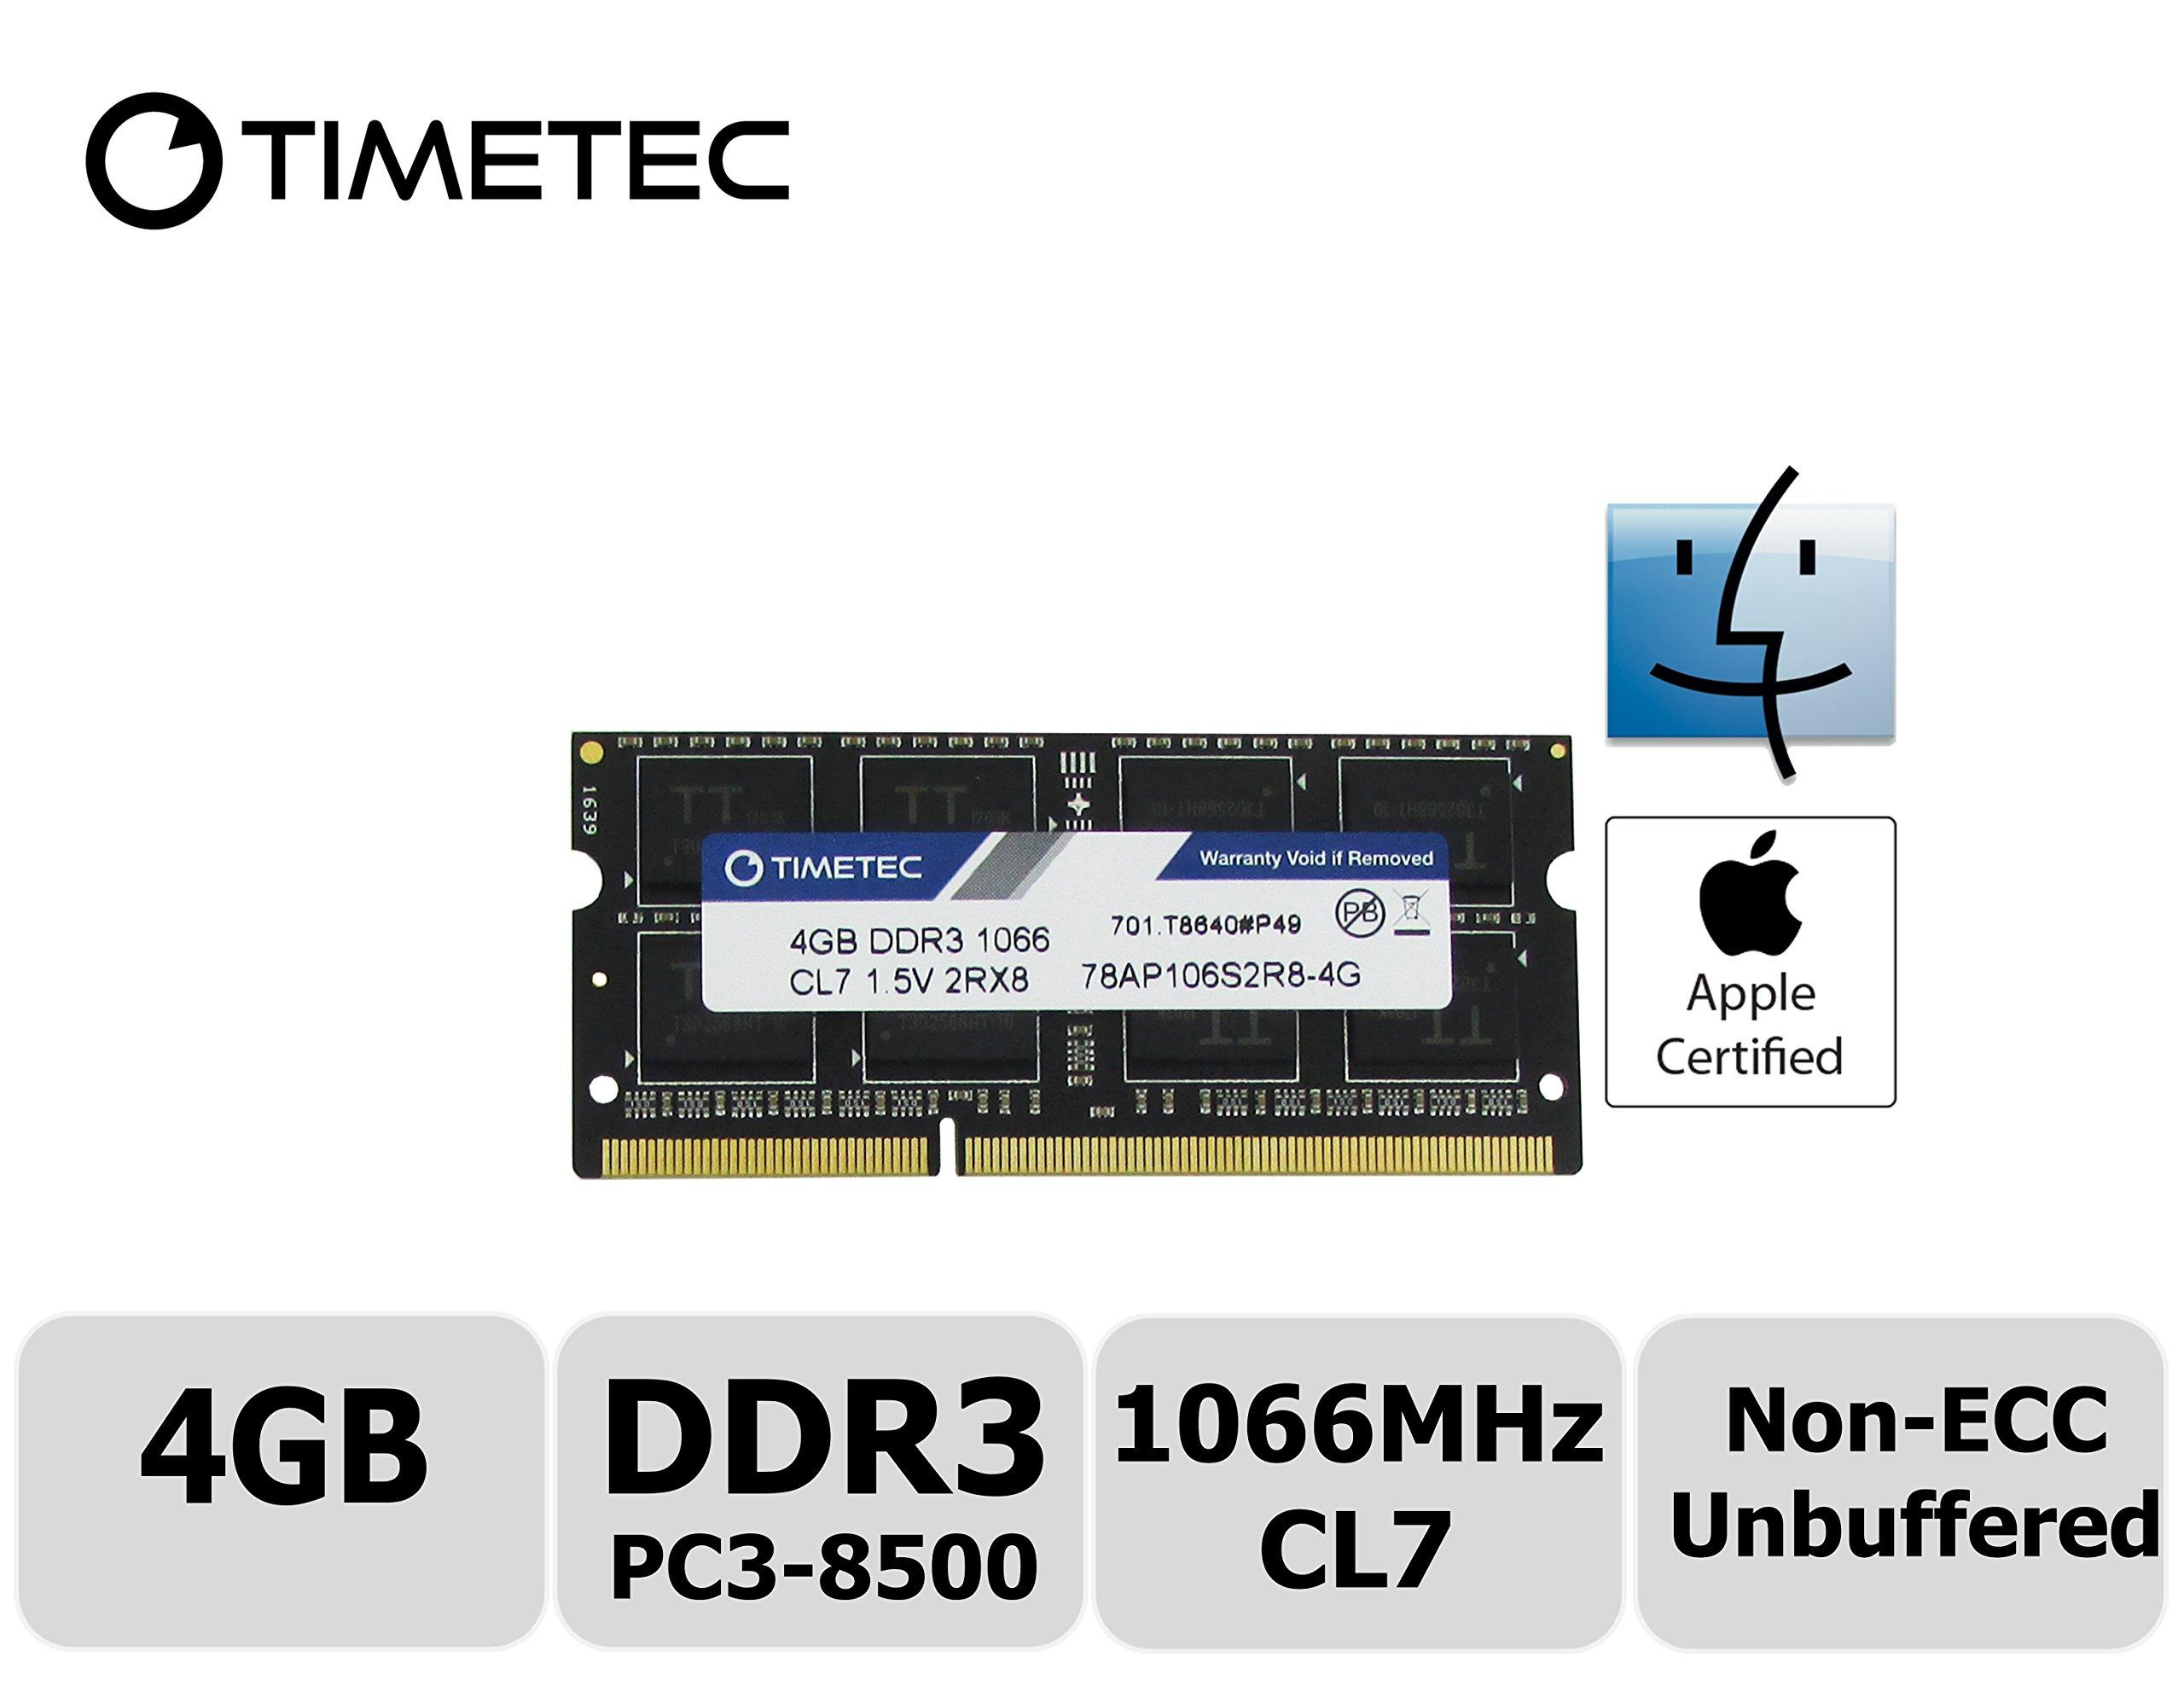 Timetec Hynix IC Apple 4GB DDR3 PC3-8500 1066MHz memory upgrade for iMac 21.5-inch/27-inch/20-inch/24-inch, MacBook Pro 17-inch/ 15-inch/ 13-inch, Mac mini (4GB)